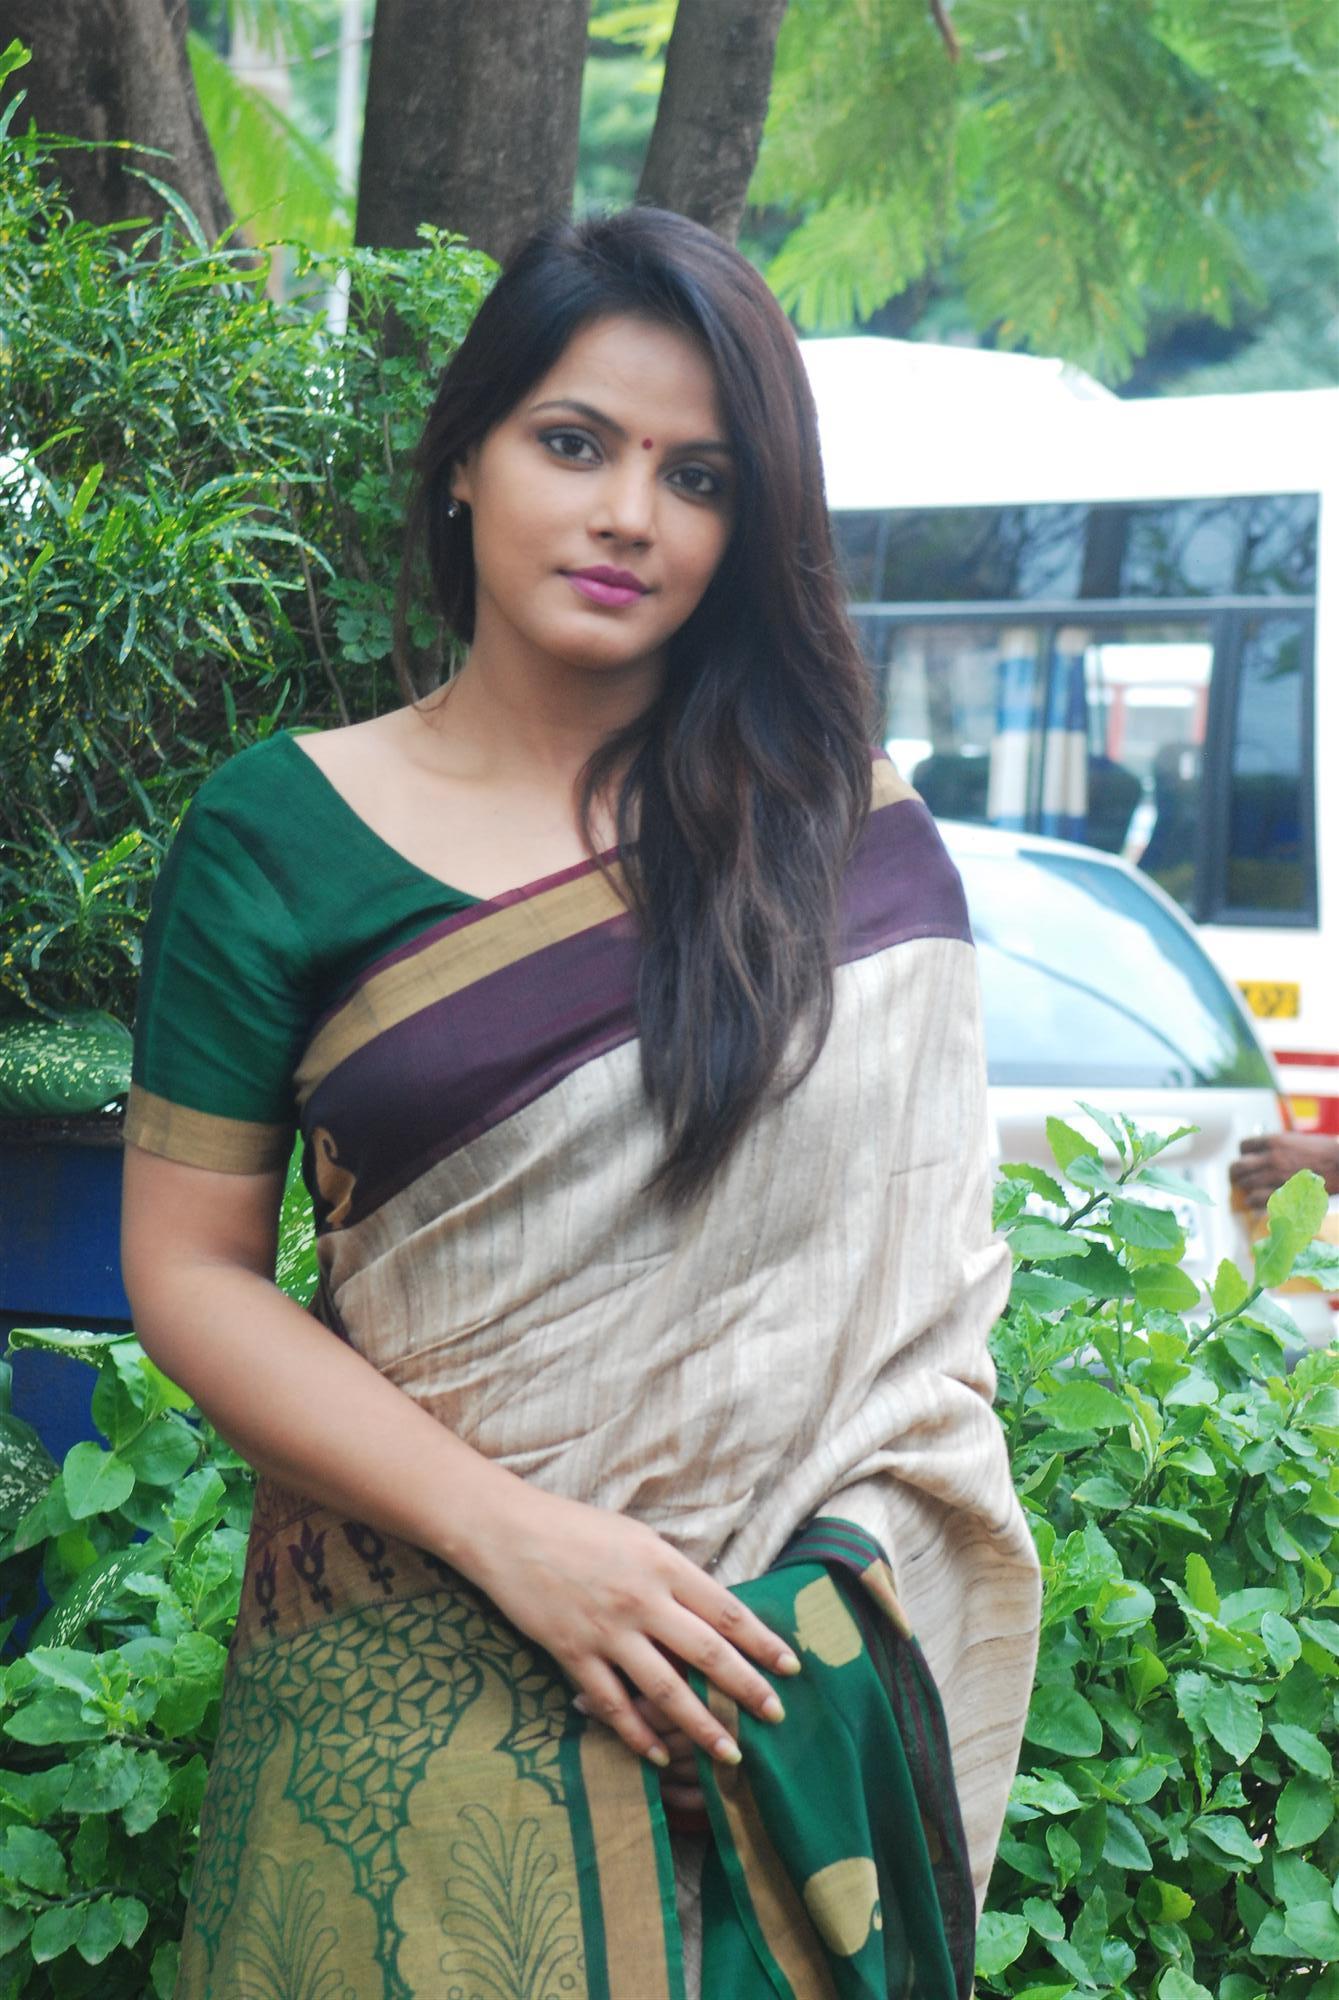 Beautiful-Neetu-Chandra-Saree-with-Bindi-Images Scorching Neetu Chandra 11+ Unseen Bikini Swimsuit Photos Age Ft Wiki